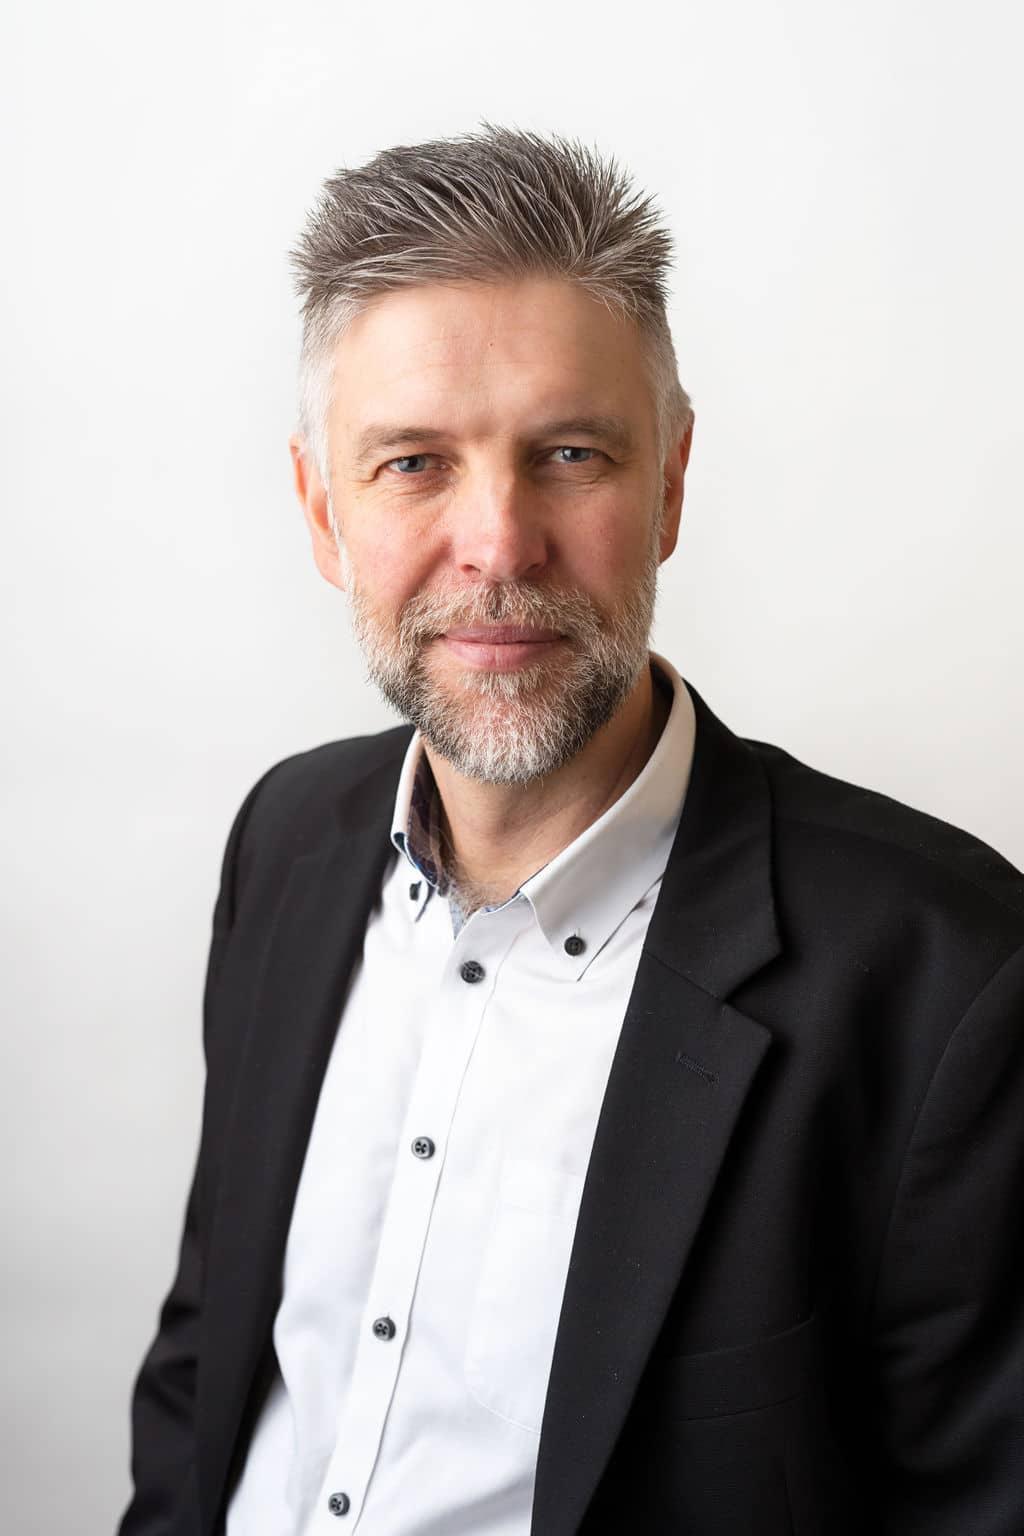 Peter Olsson